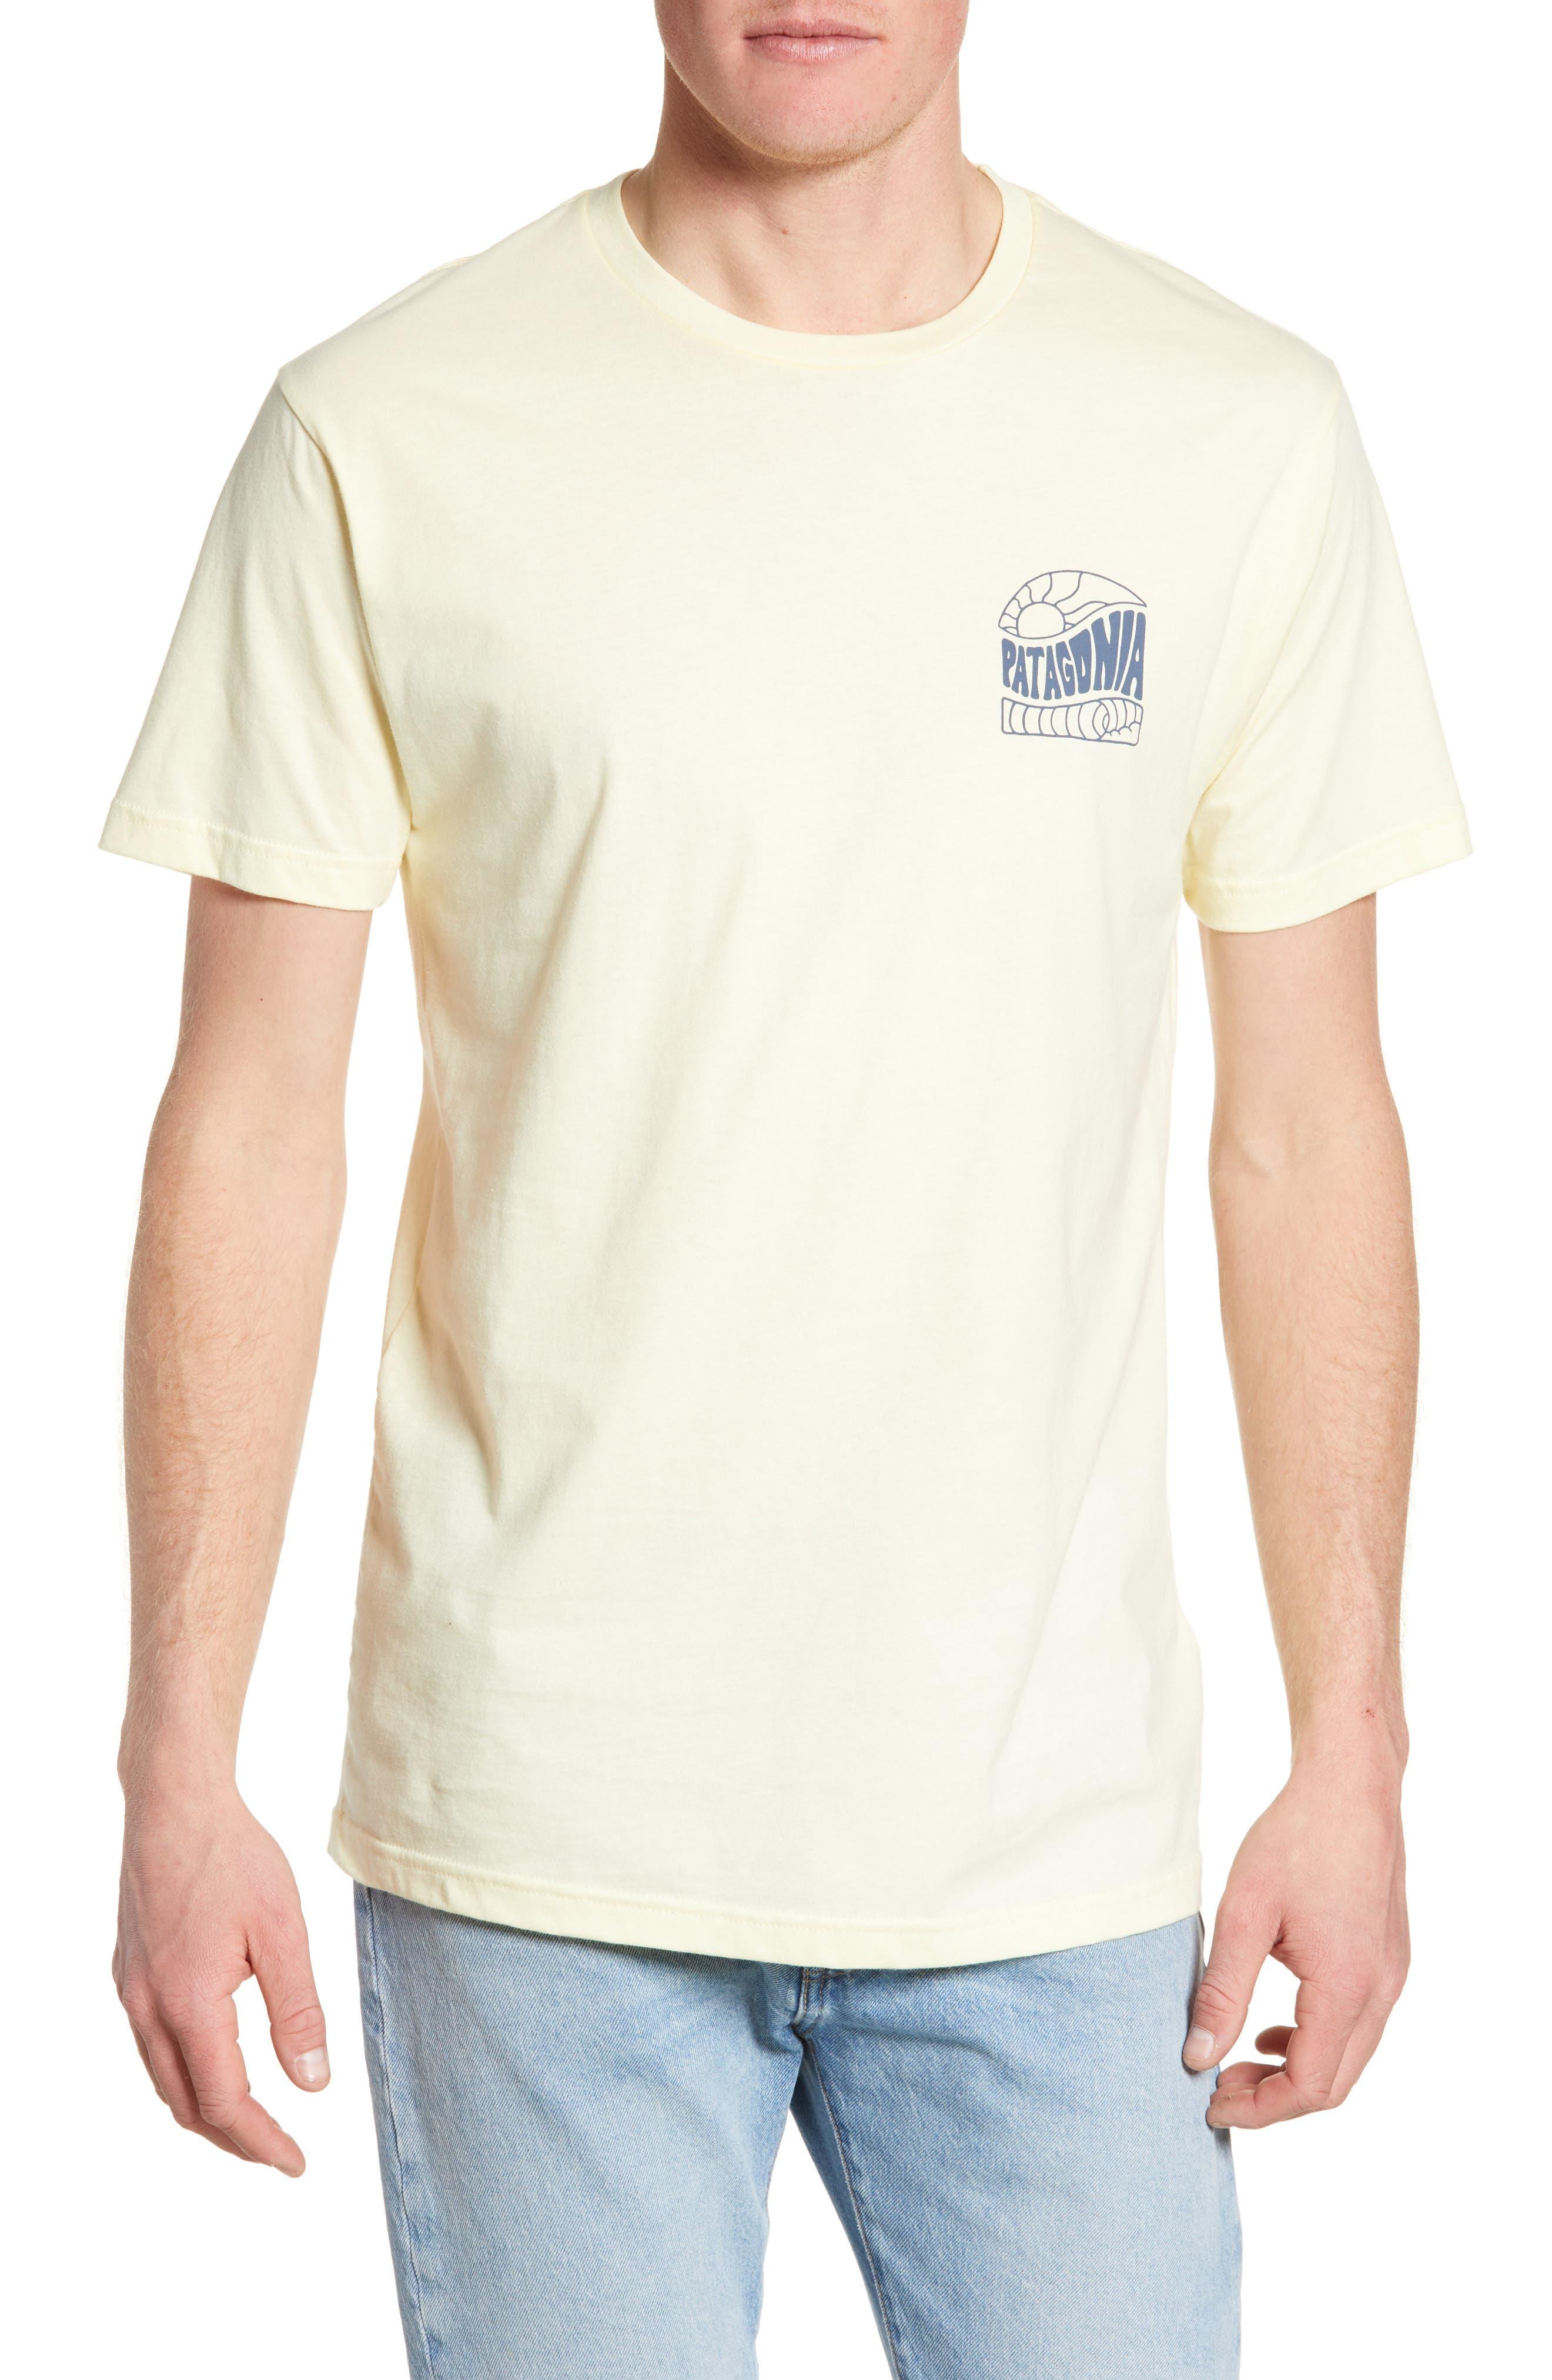 Patagonia Cosmic Peaks Graphic Organic Cotton T-Shirt, Yellow